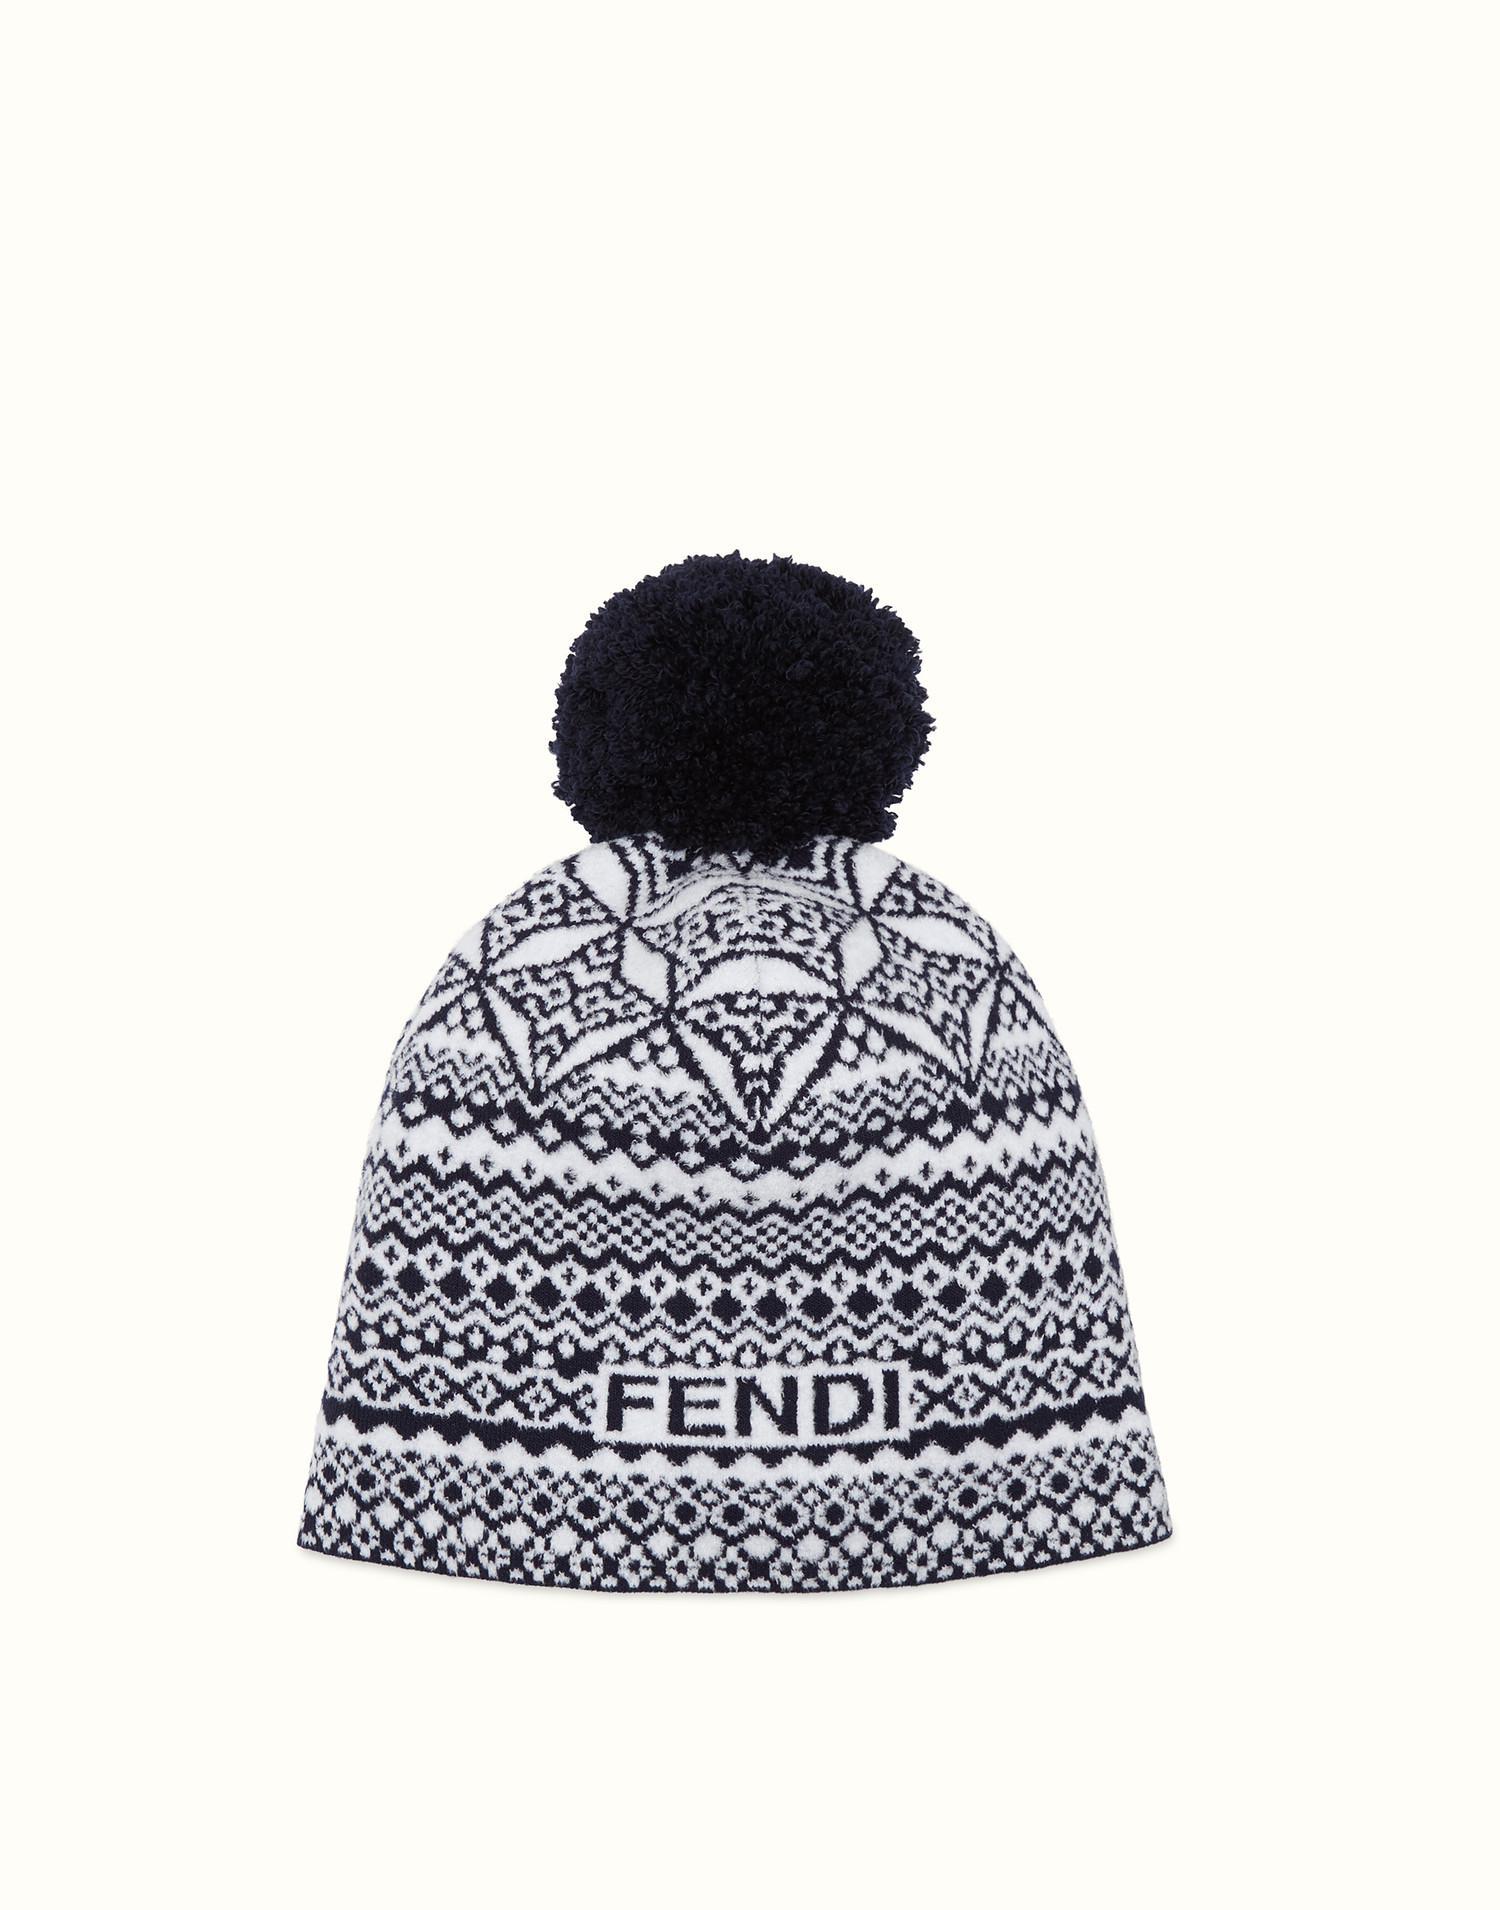 embroidered pom-pom beanie hat - Black Fendi YWg0DOa